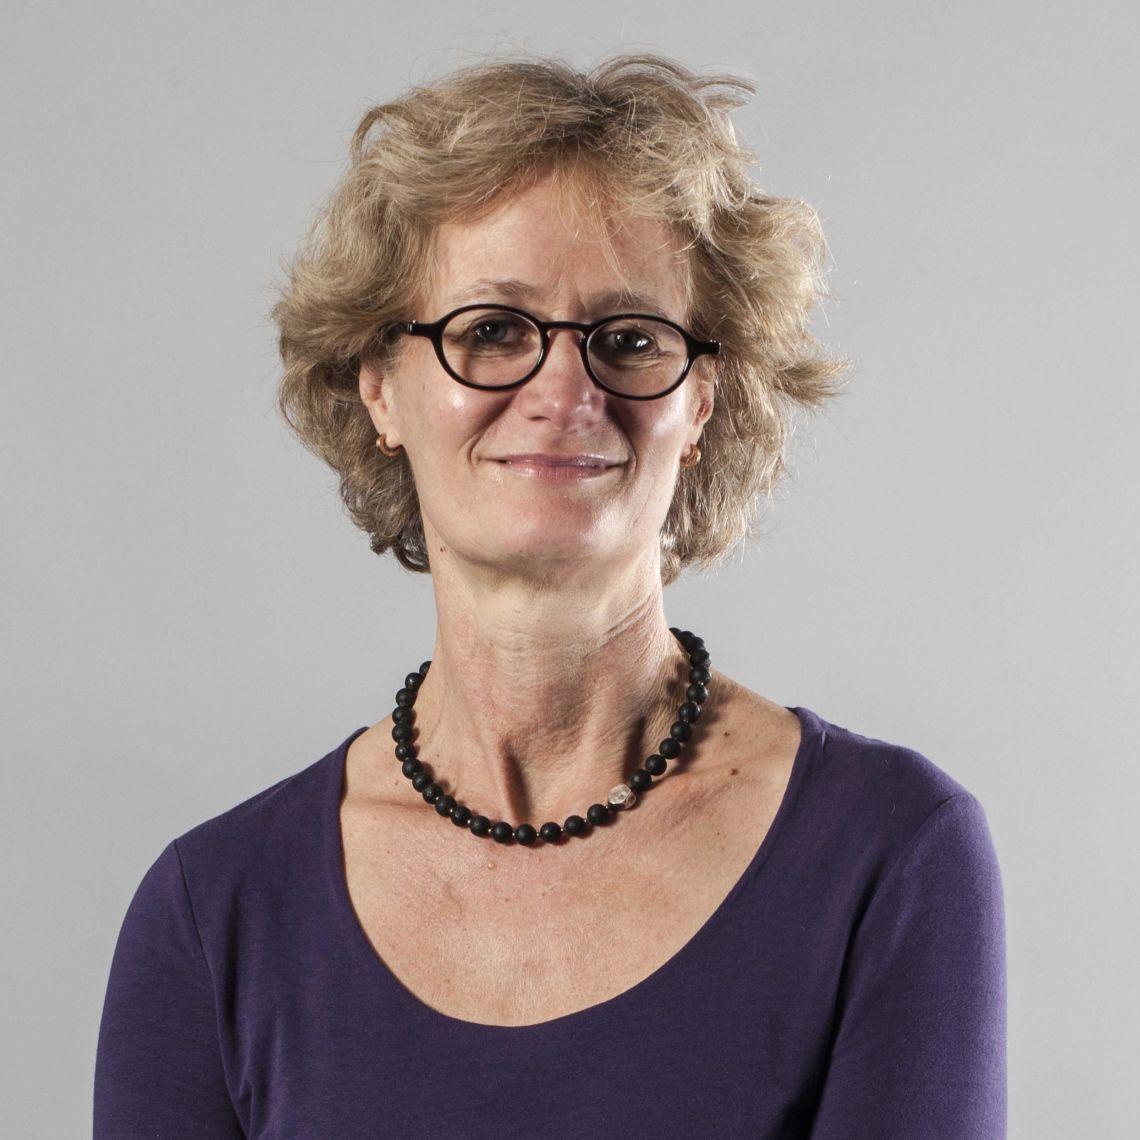 Professor Sasha Shepperd